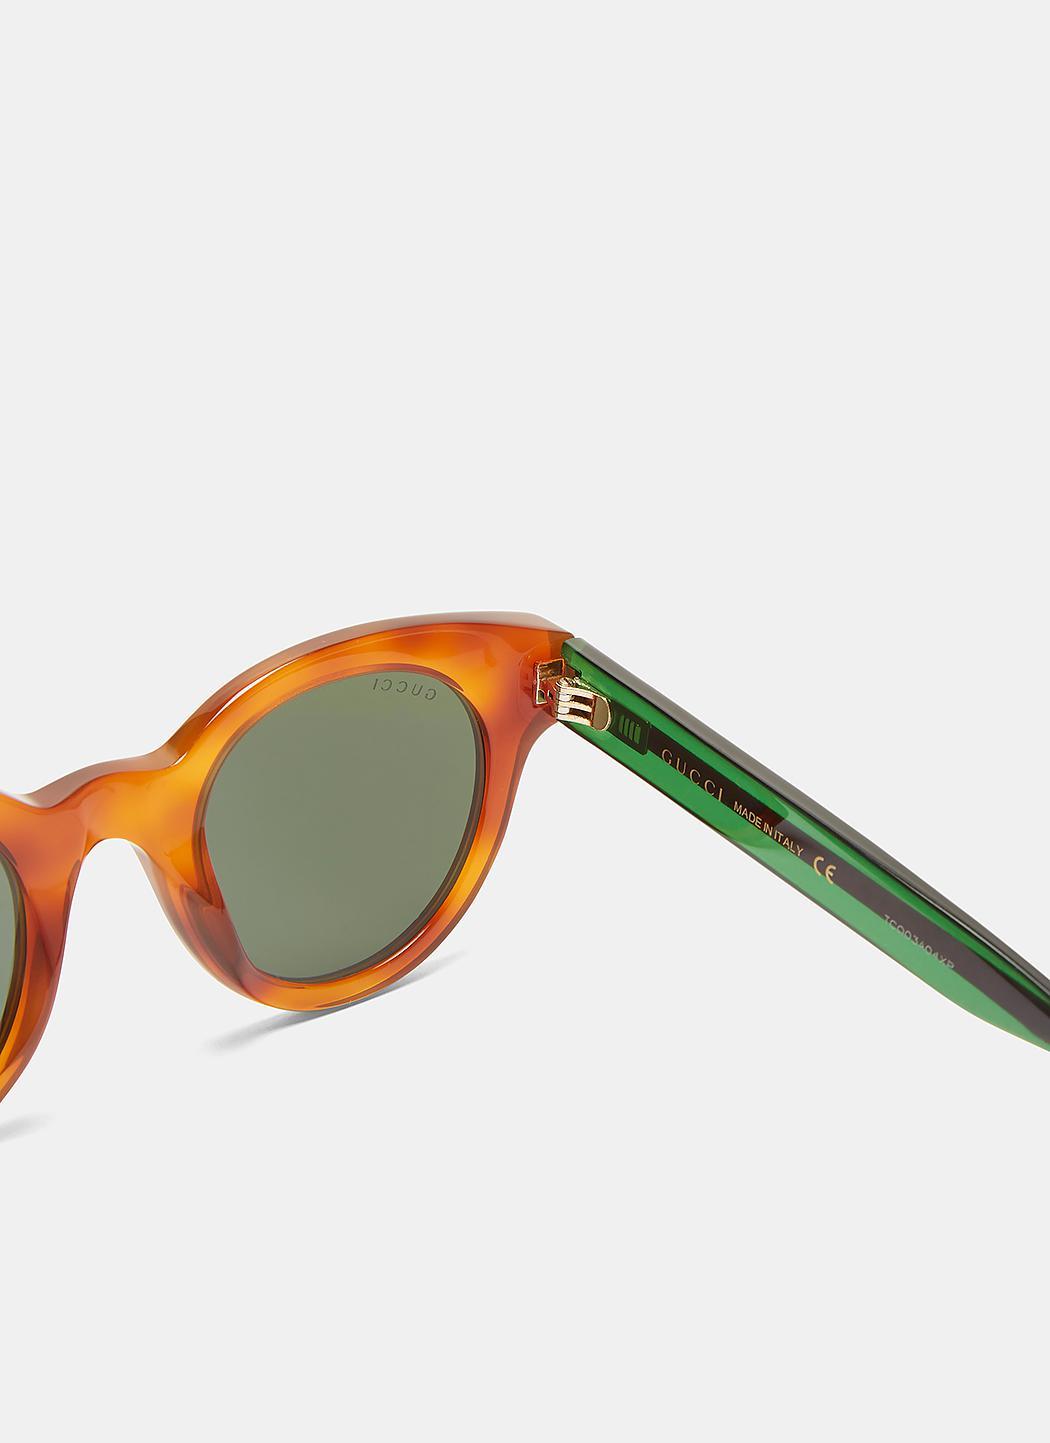 1a42ef2a9ec68 Gucci Men s Tortoiseshell Striped Arm Round Sunglasses In Brown ...